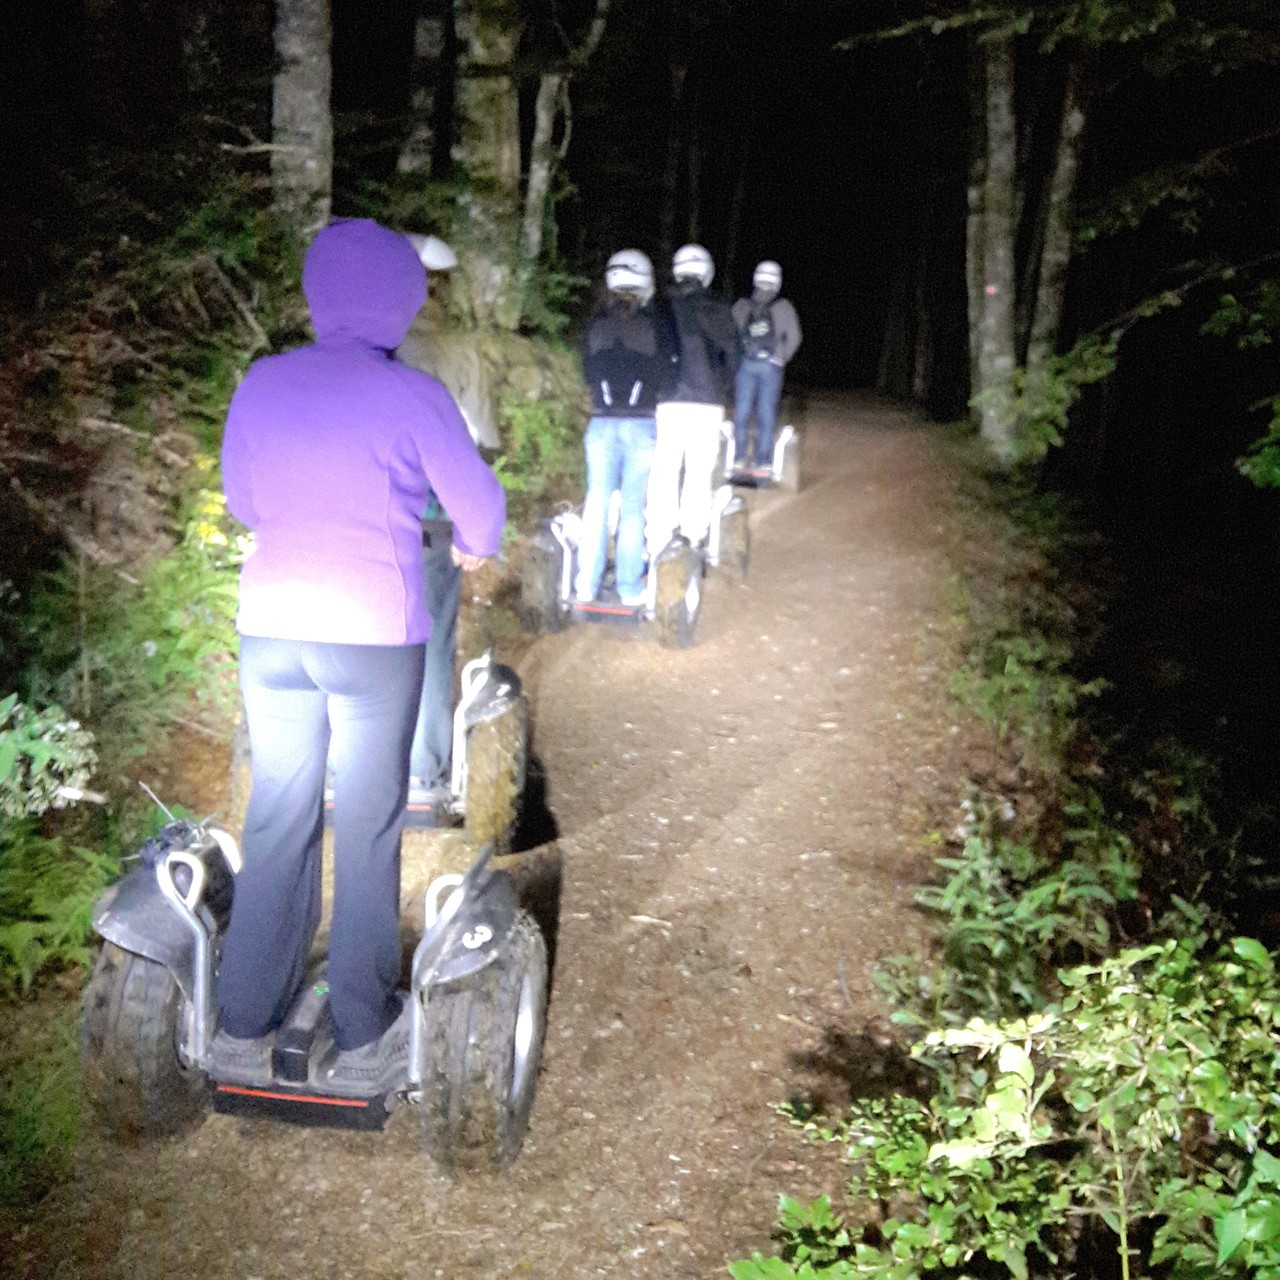 FUN MOVING GYROPODE SEGWAY EN ALSACE - ferme auberge, nocturne, Vosges